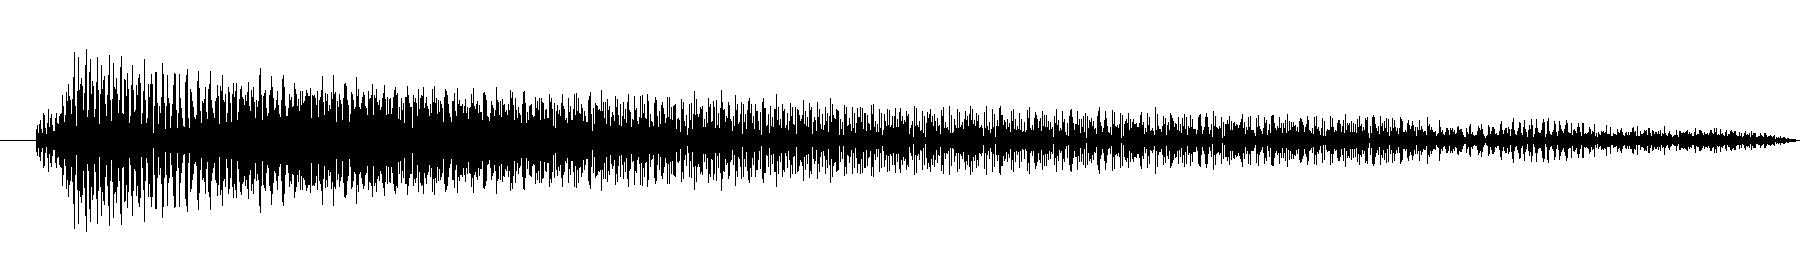 perc 1 45